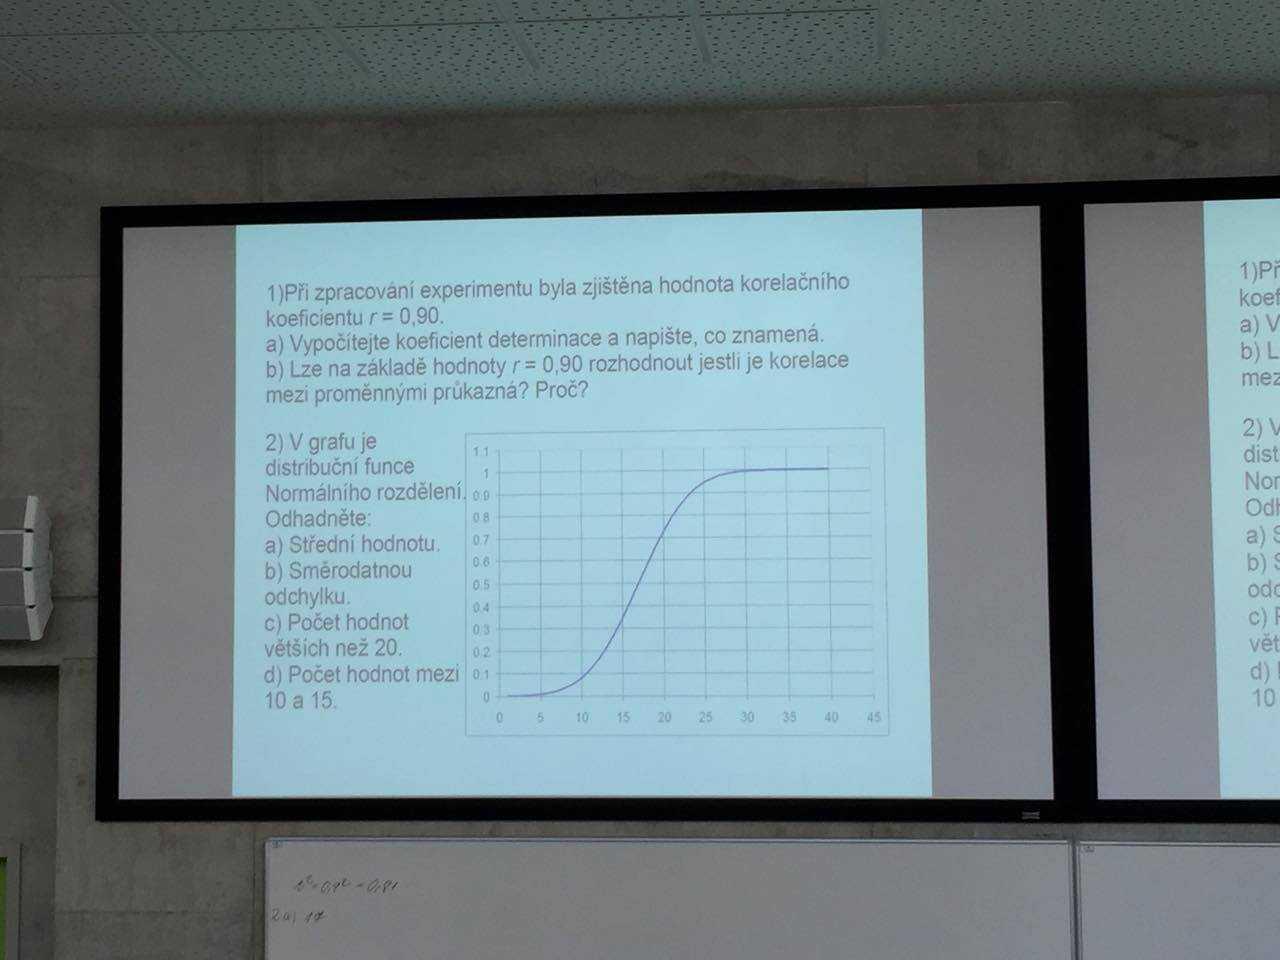 http://forum.matematika.cz/upload3/img/2016-06/51231_distribu%25C4%258Dn%25C3%25AD%2Bfunkce.jpg